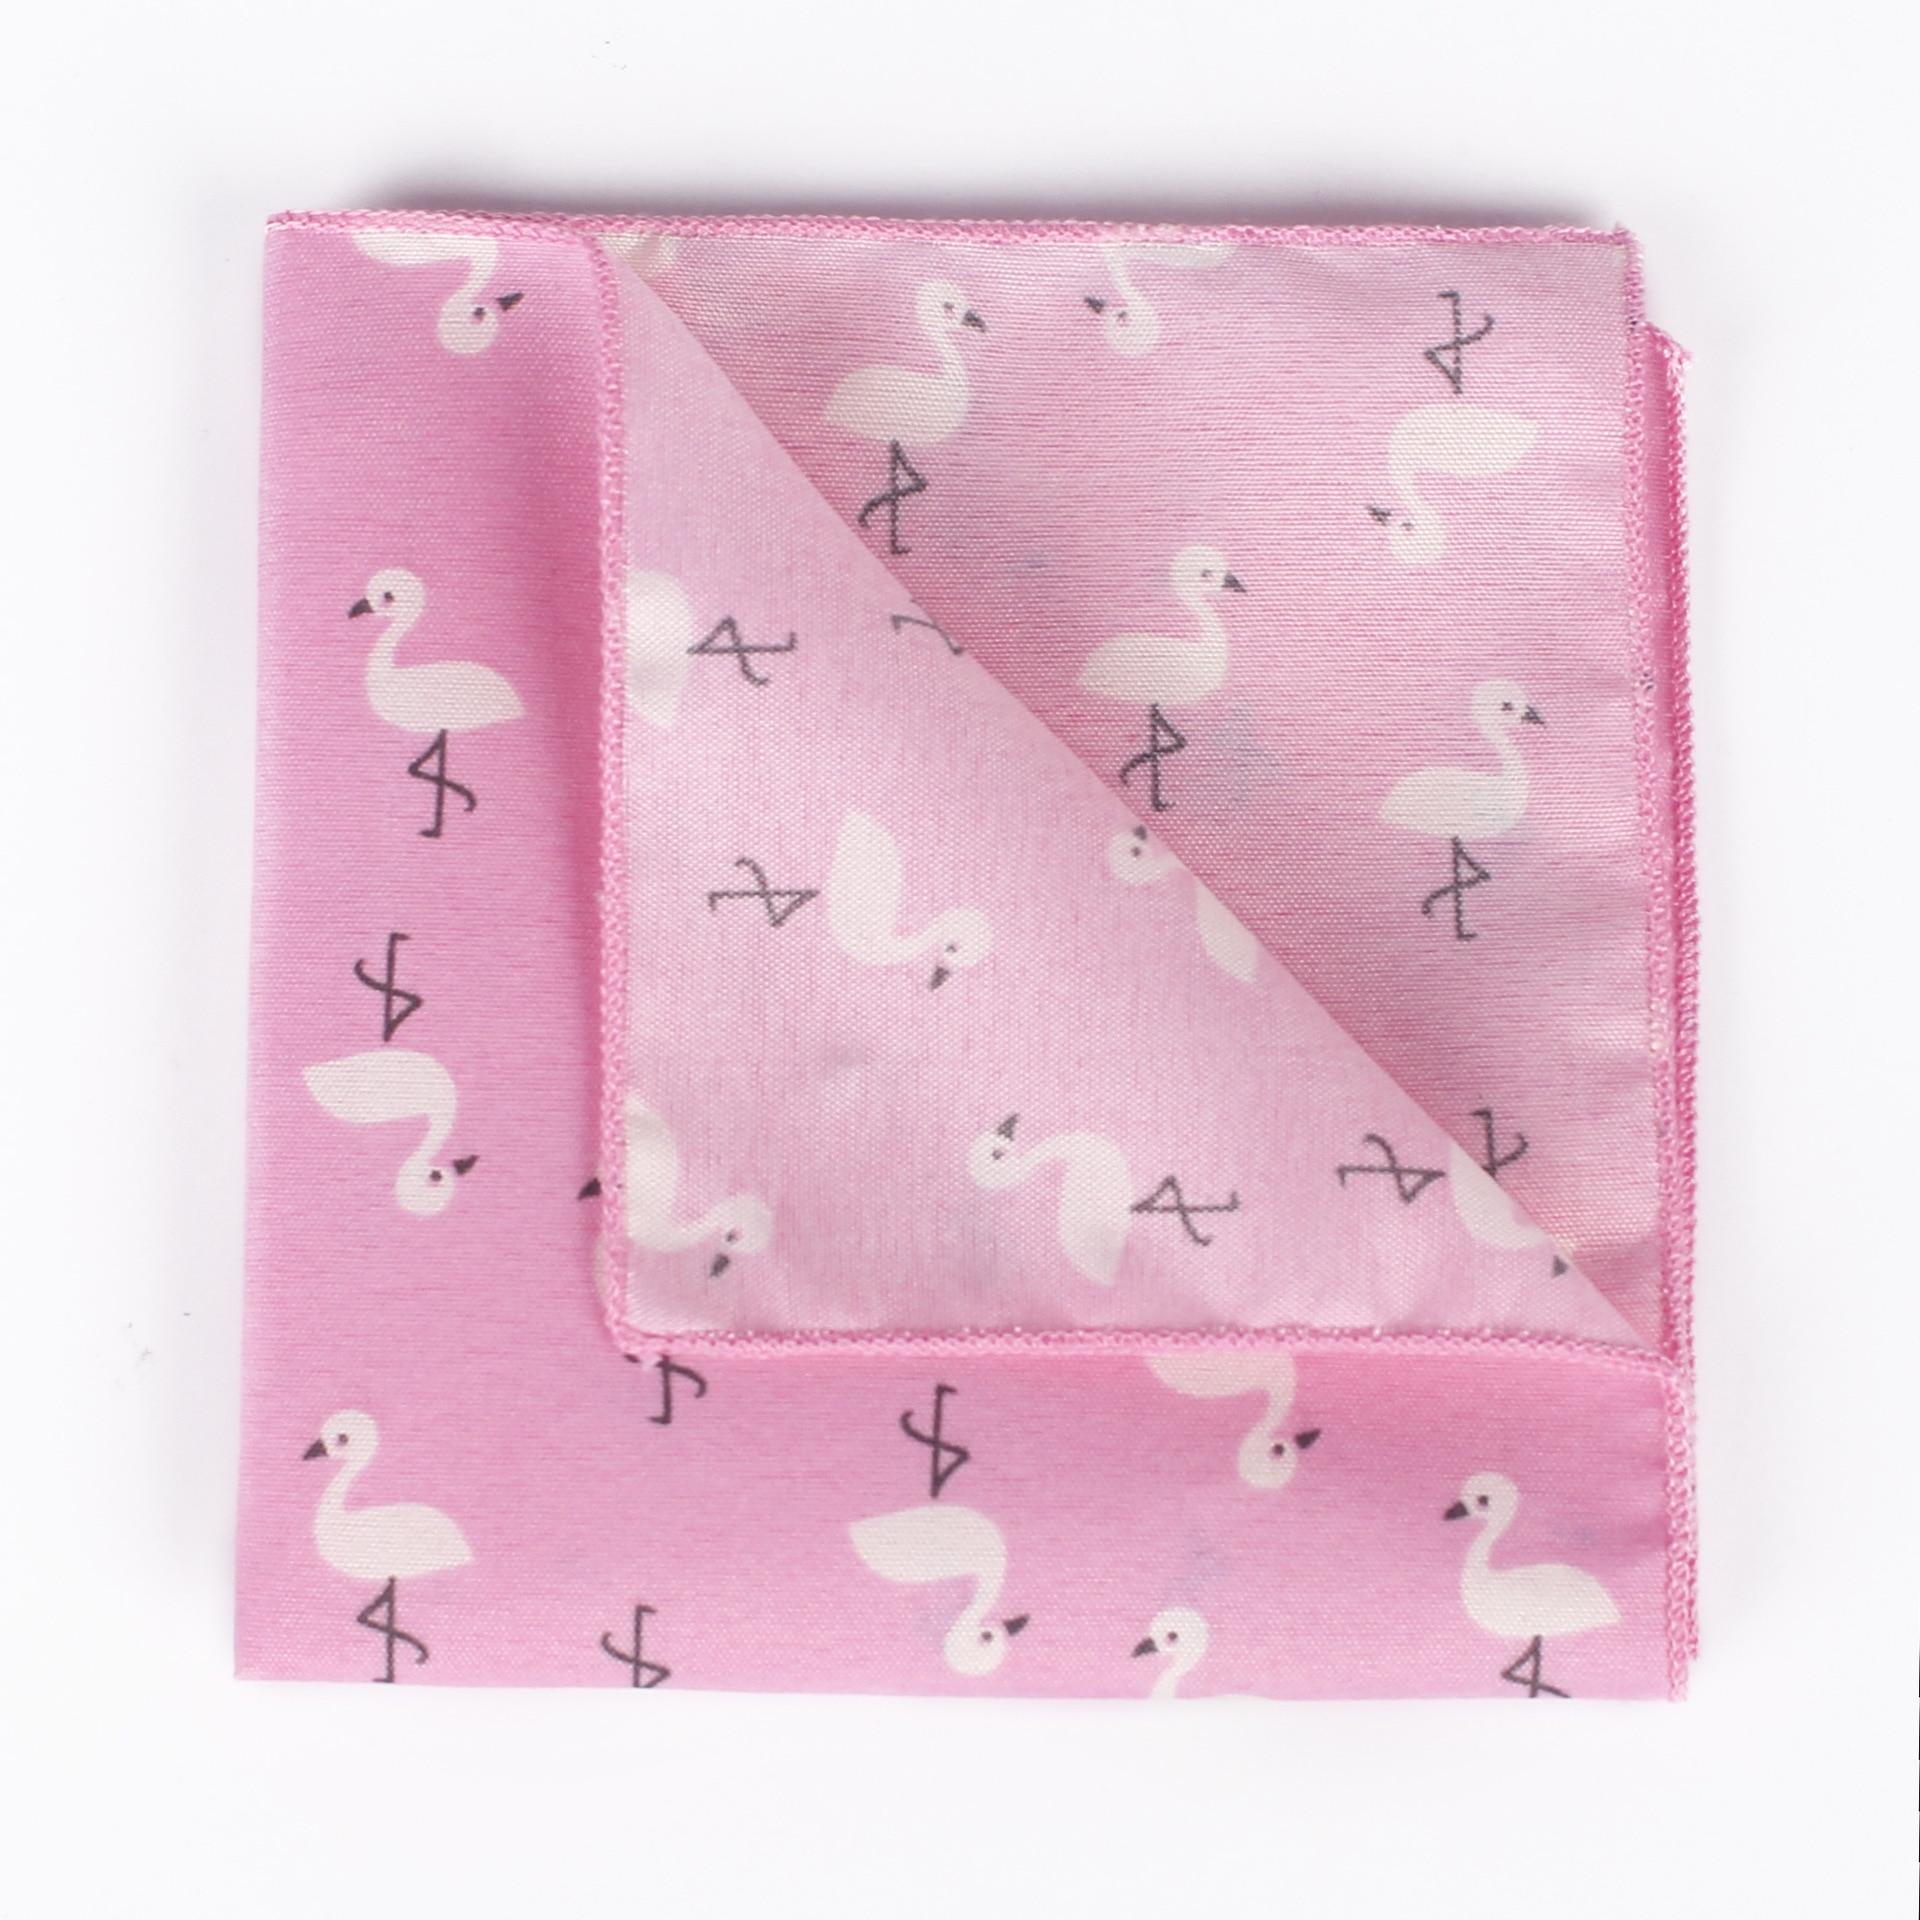 2019 New Men's Suit Pocket Handkerchief Cartoon Animal Print Square Scarf European And American Fashion